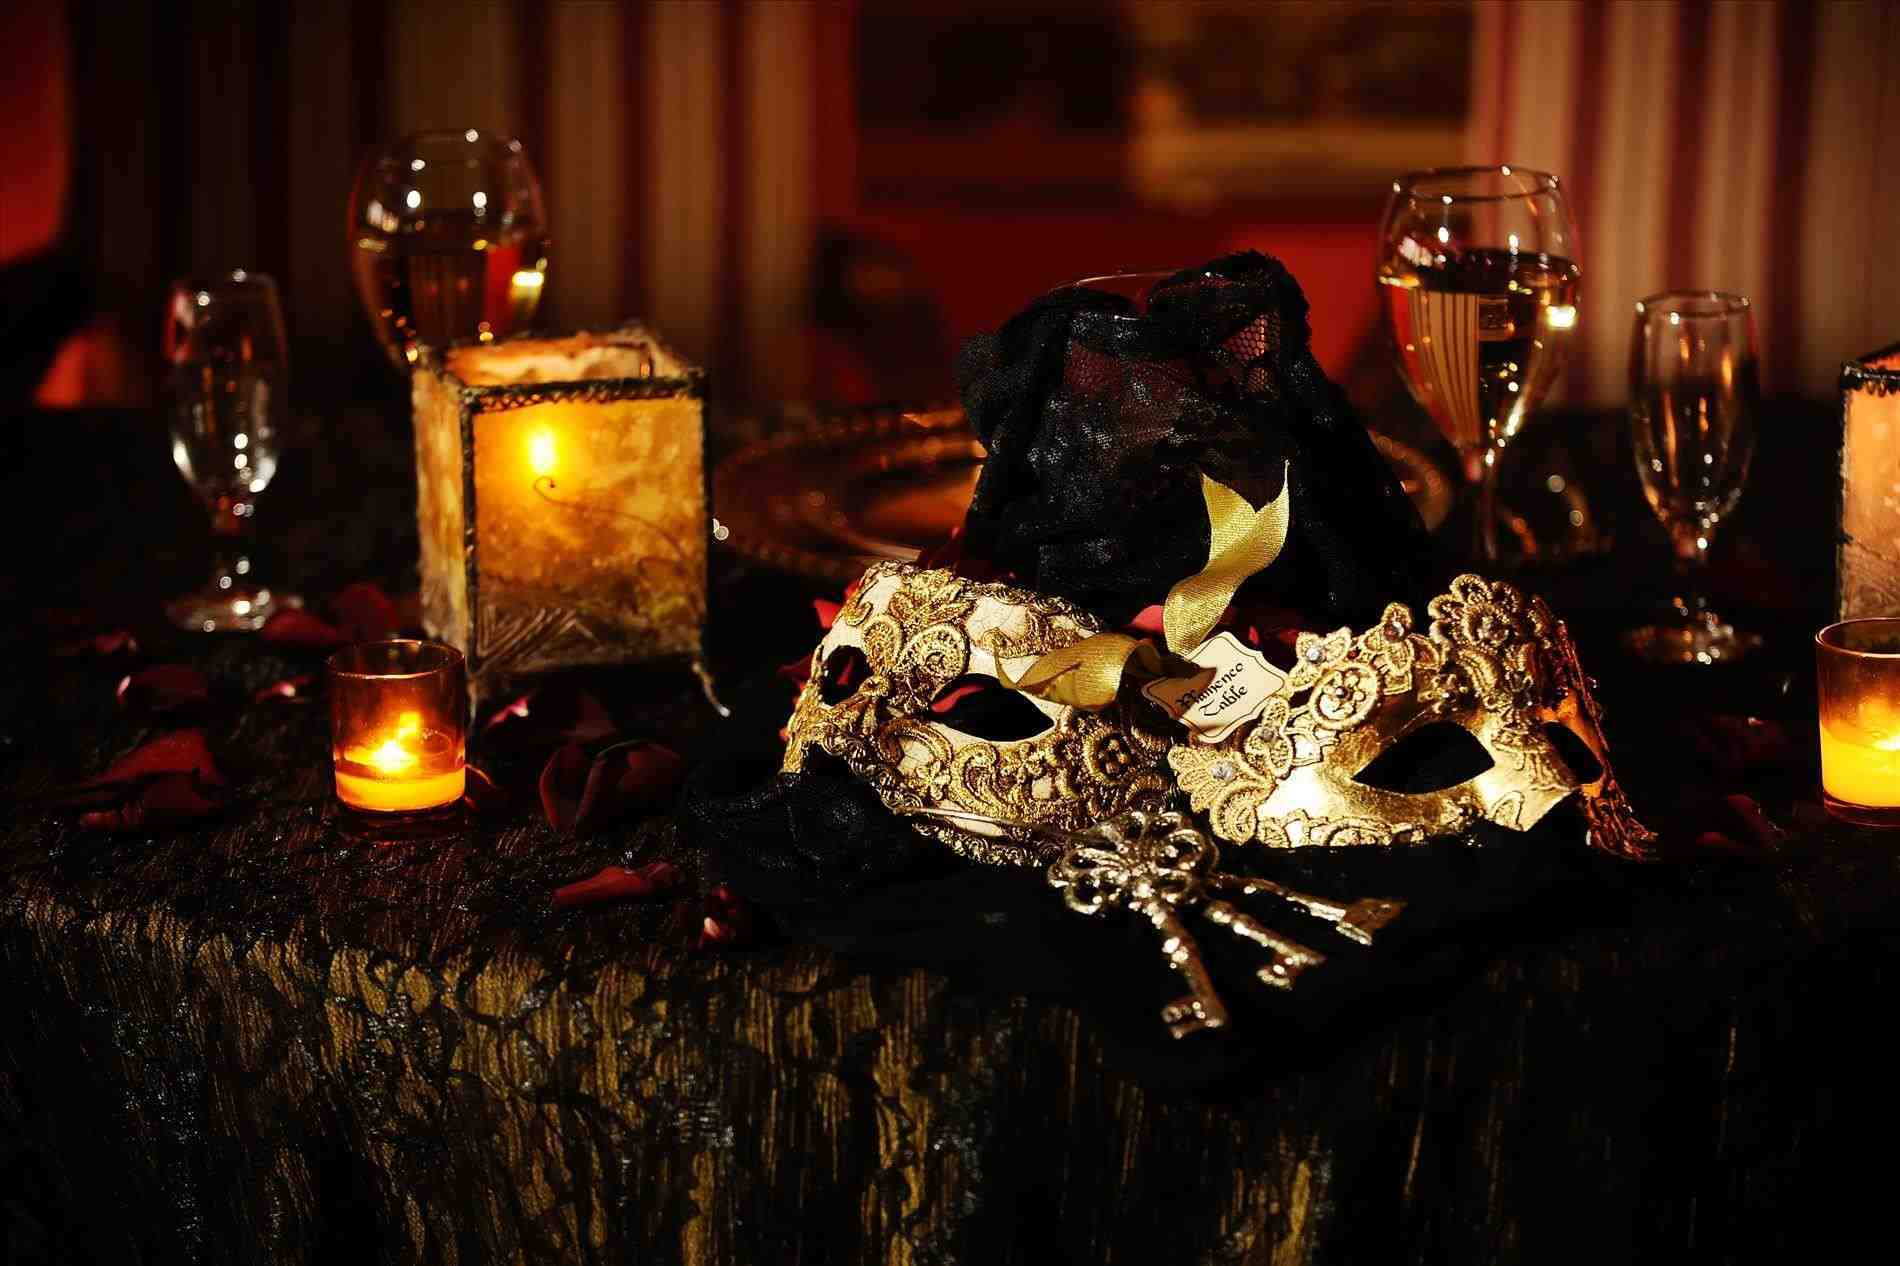 Masquerade-Ball-Decorations-masquerade-party-food-exactly-unusual-article-happy-italian-themed-wedding-table-decor-using-balocoloc-venetian-masks-italian-Venetian.jpg